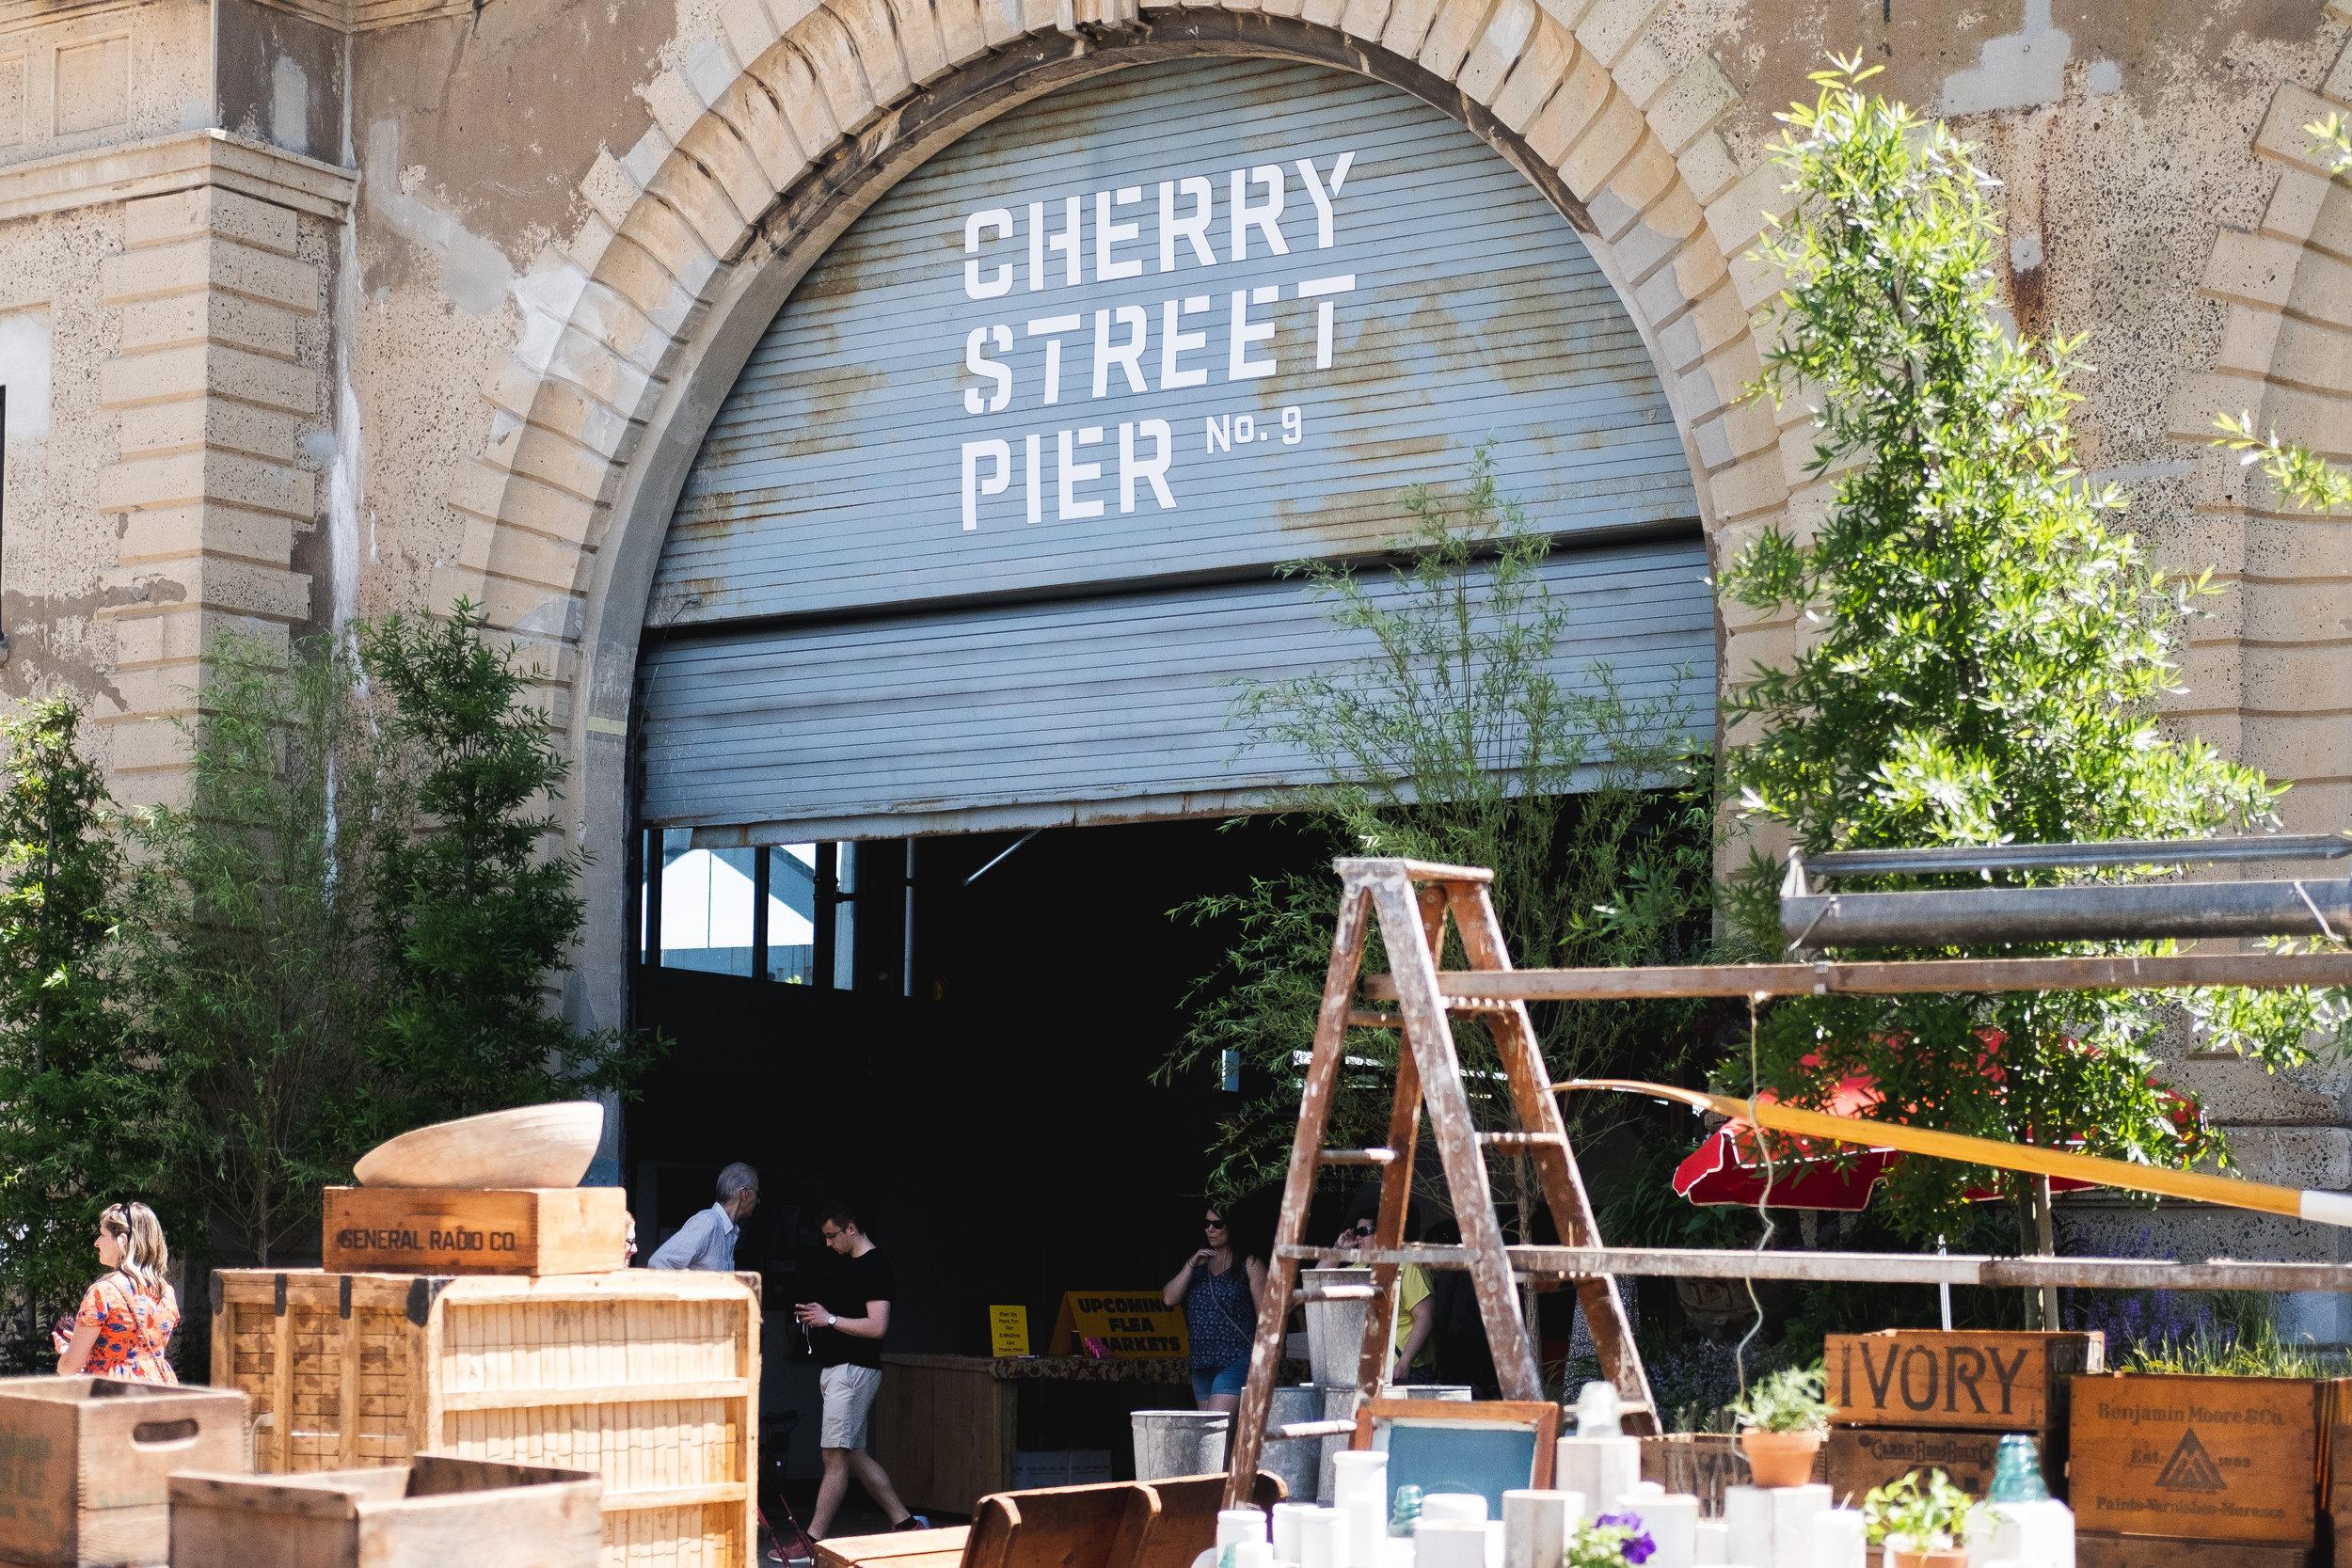 2019_CHERRY ST PIER_PHL FLEA MARKET_LOCATIONS_THE PHILLY CHECKLIST-2.jpg